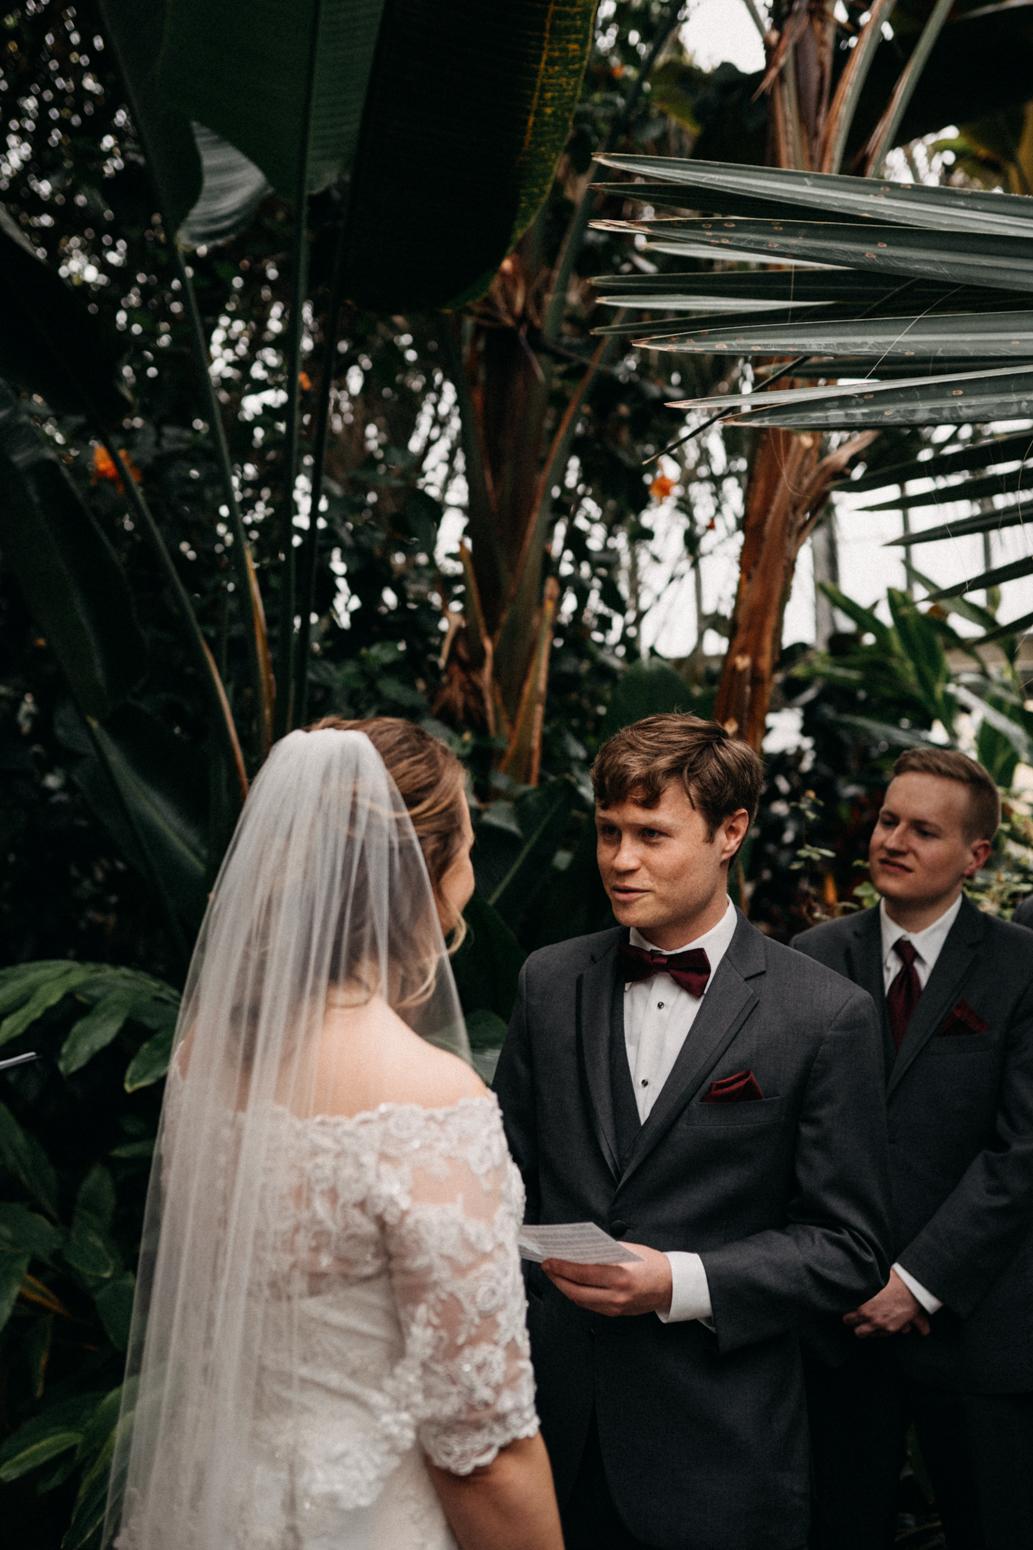 Rochester, NY Wedding Photographer (53 of 96).JPG